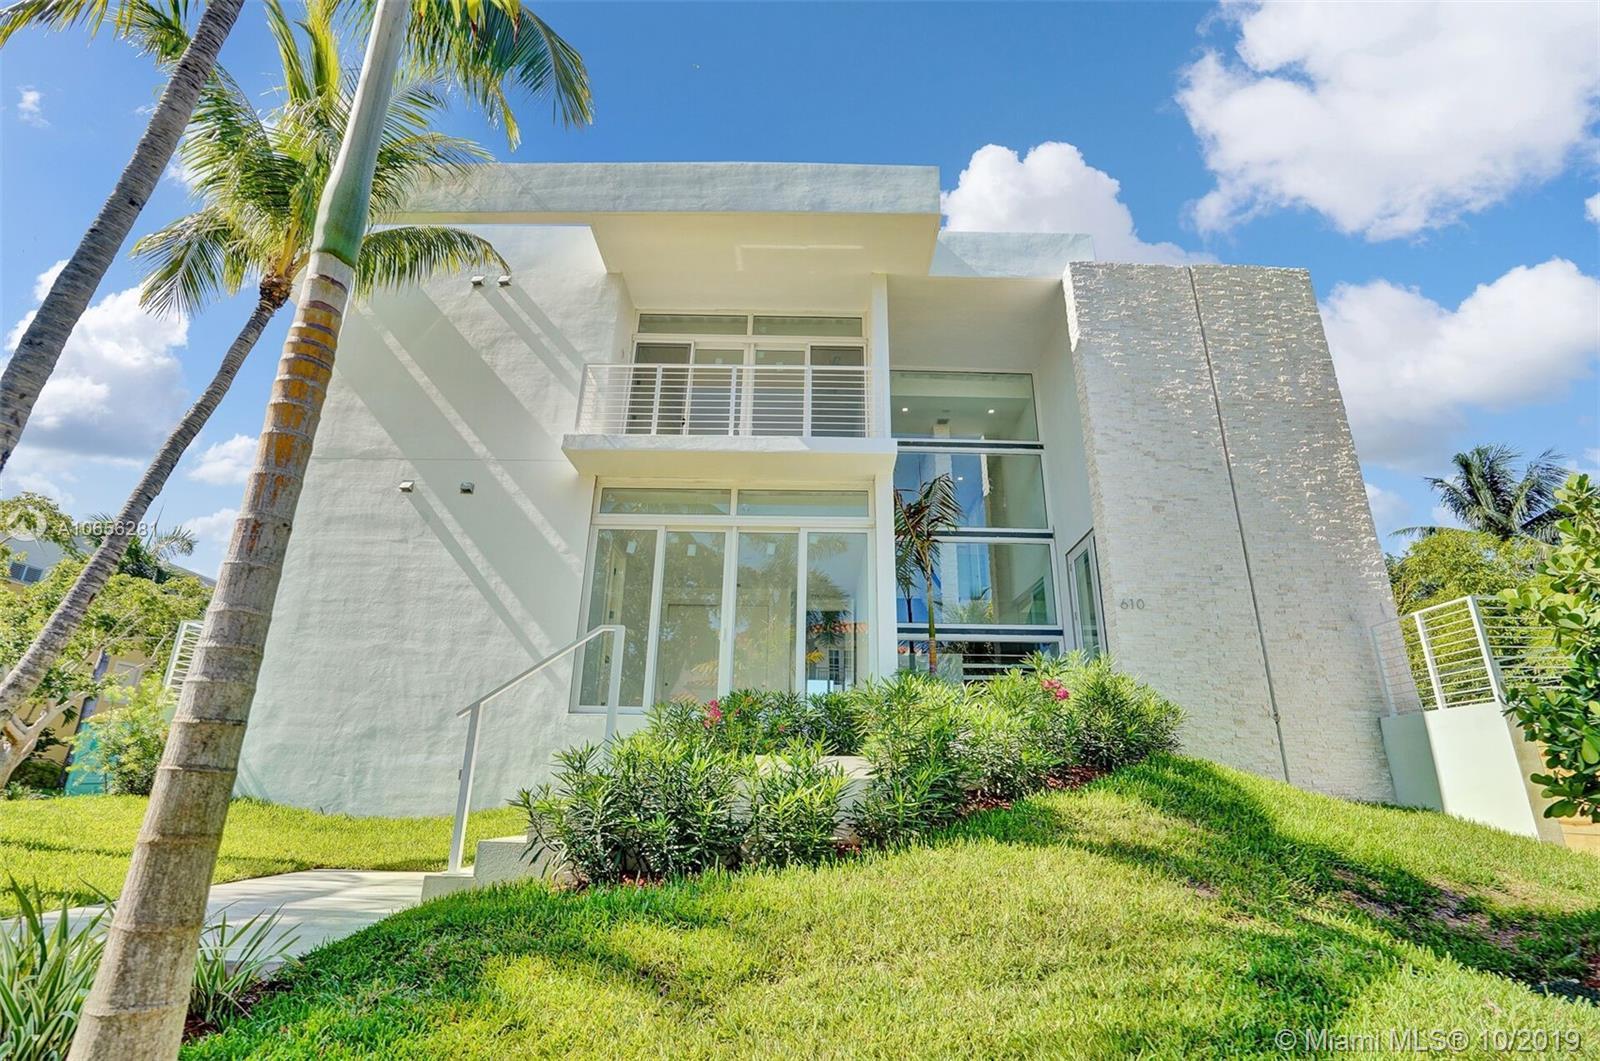 610 Ridgewood Rd, Key Biscayne, Florida